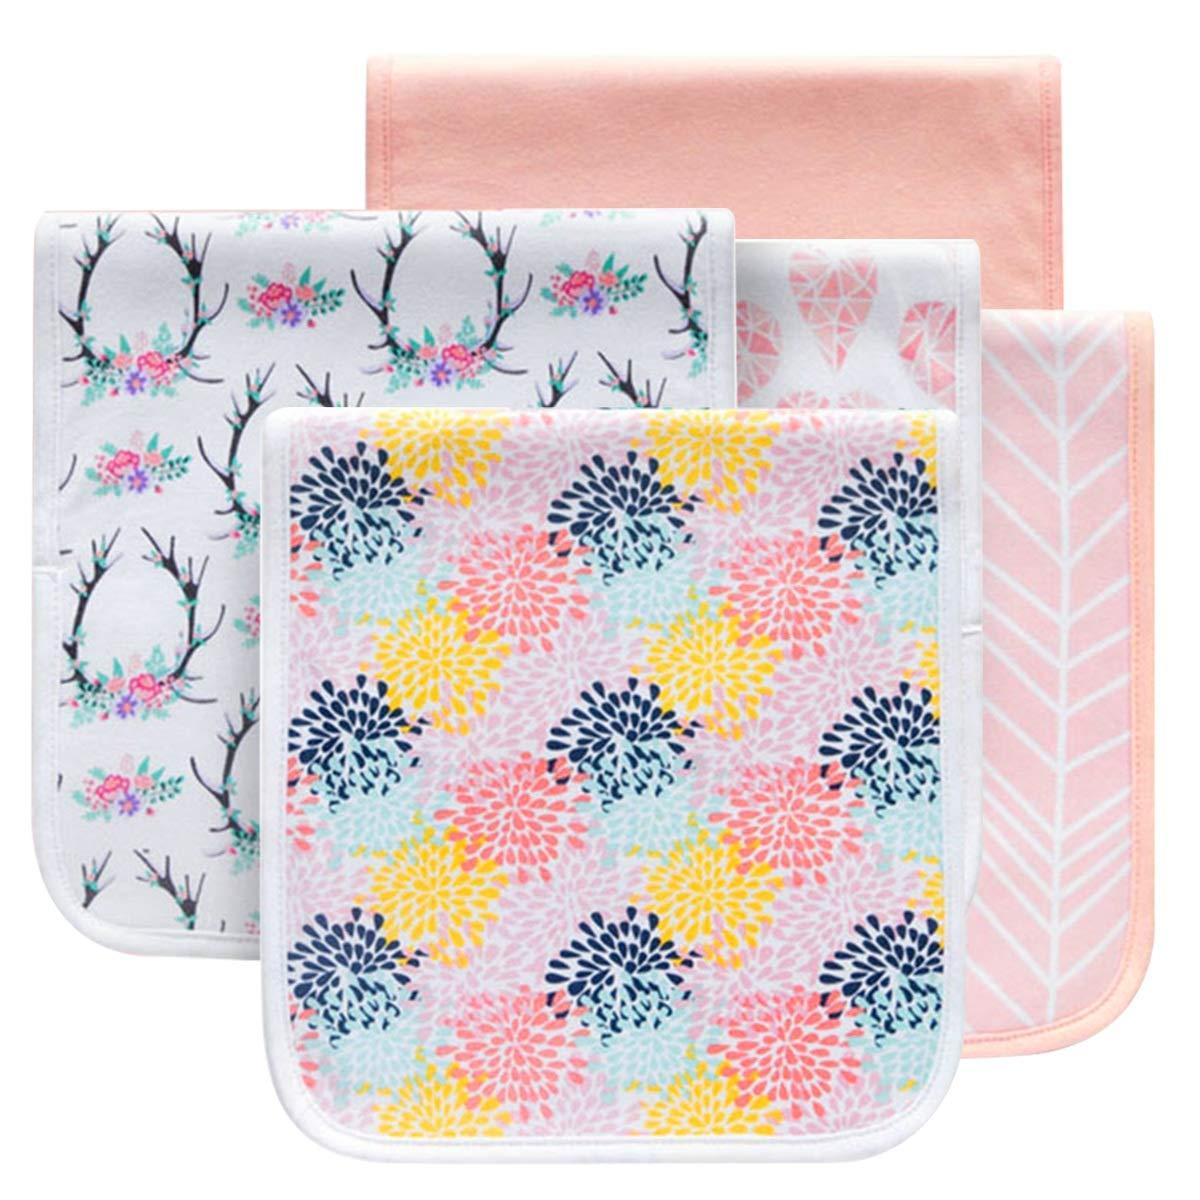 Color : 01# 5pcs//lot 5pcs//lot Reusable Washable Cotton Baby Bibs 3-Layer Absorbent Burp Cloth Infant Meal Feeding Milk Saliva Towel